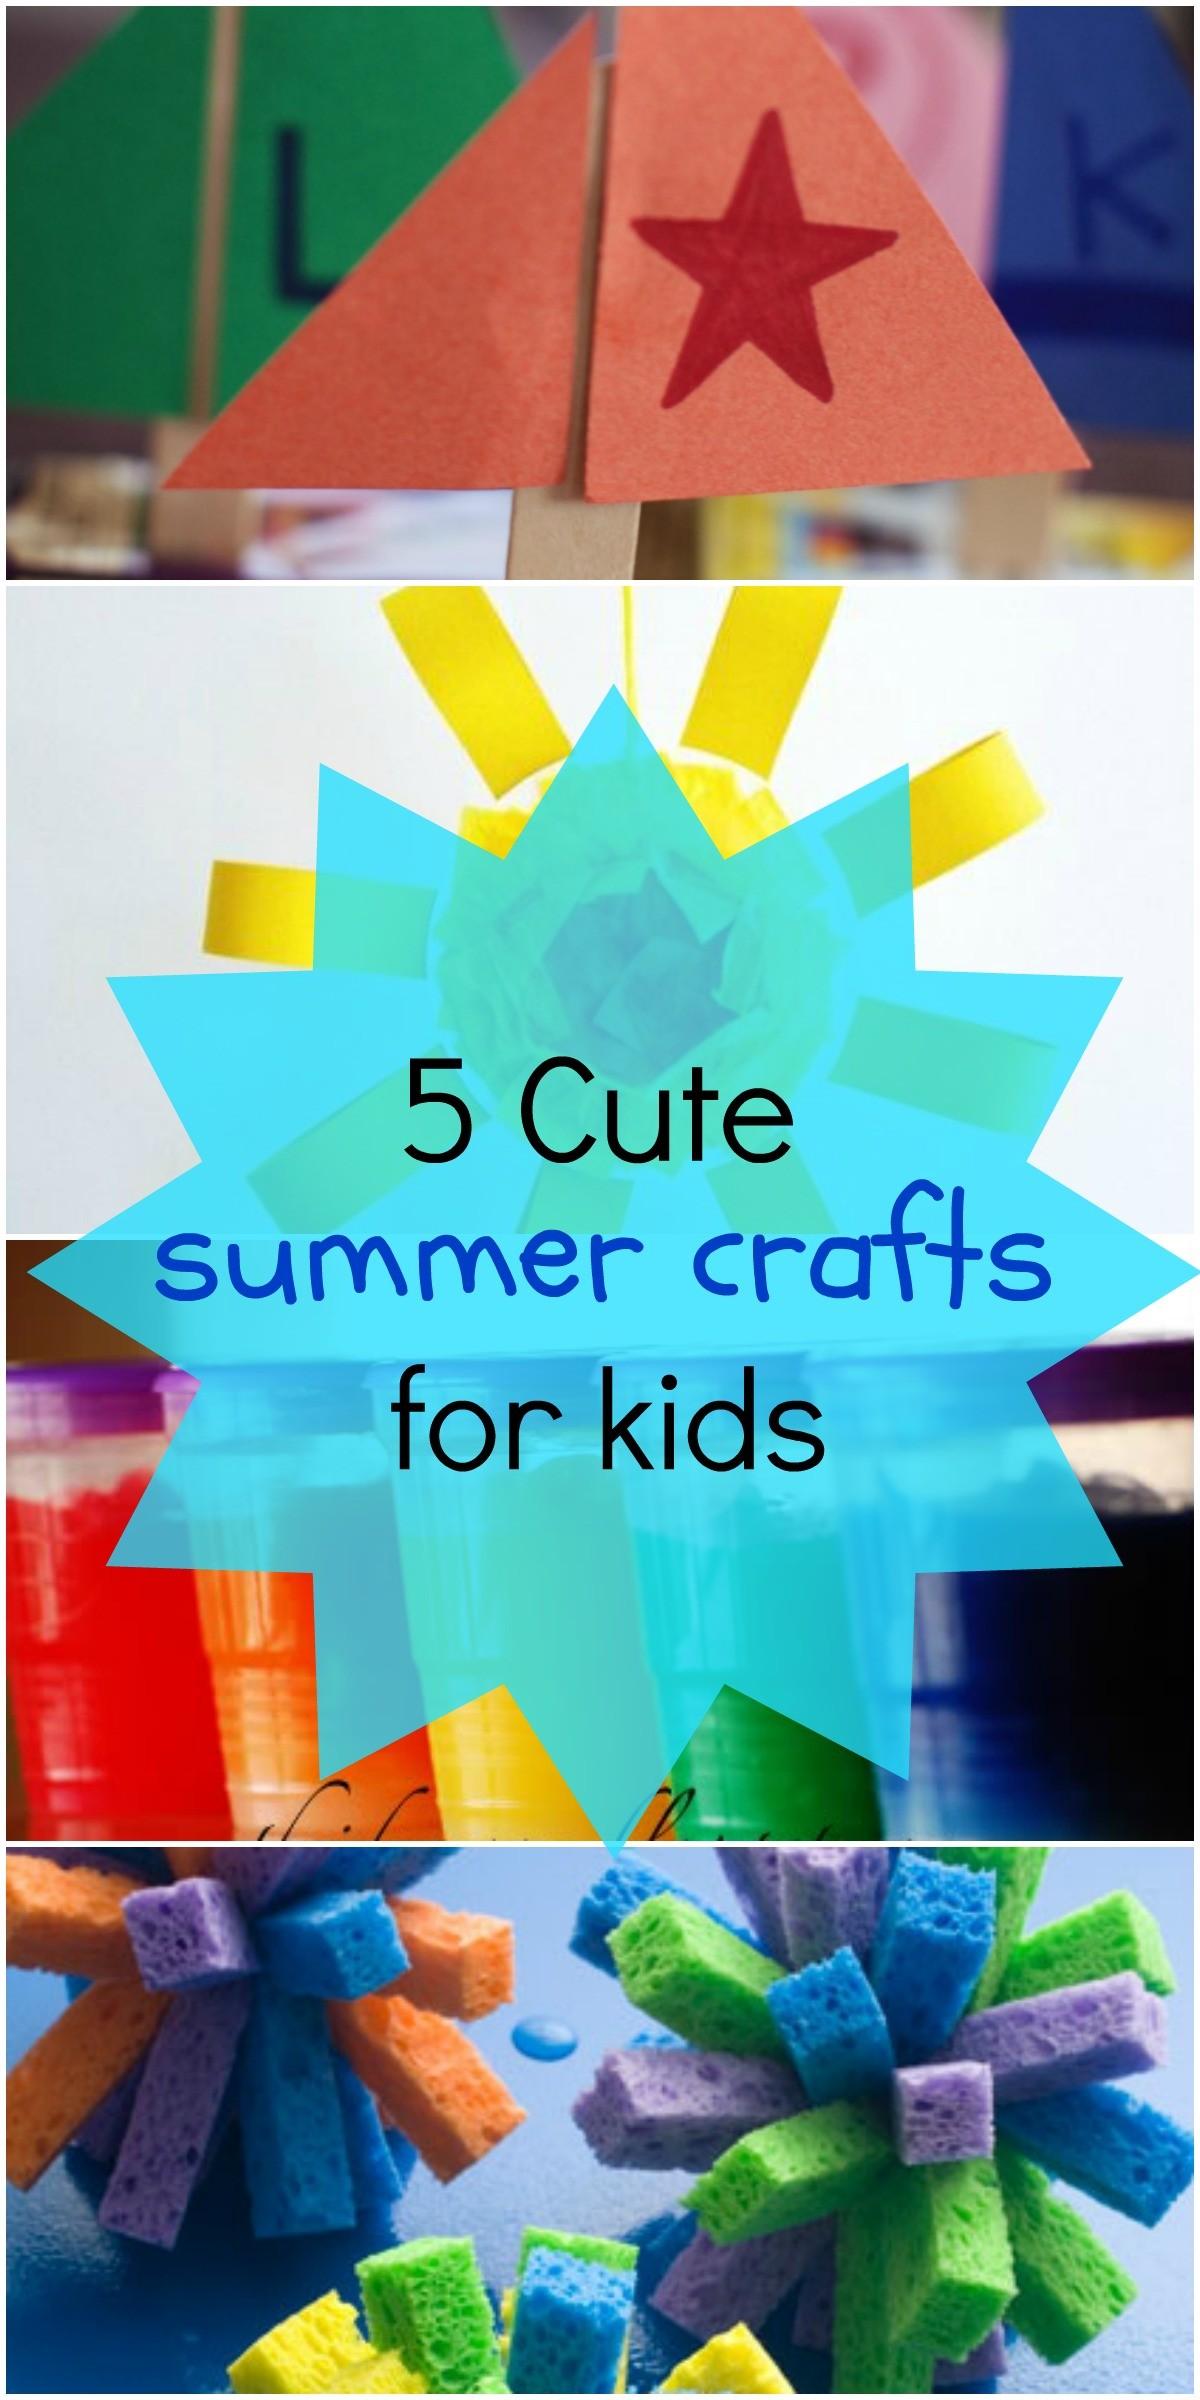 5 Fun Summer Crafts For Kids